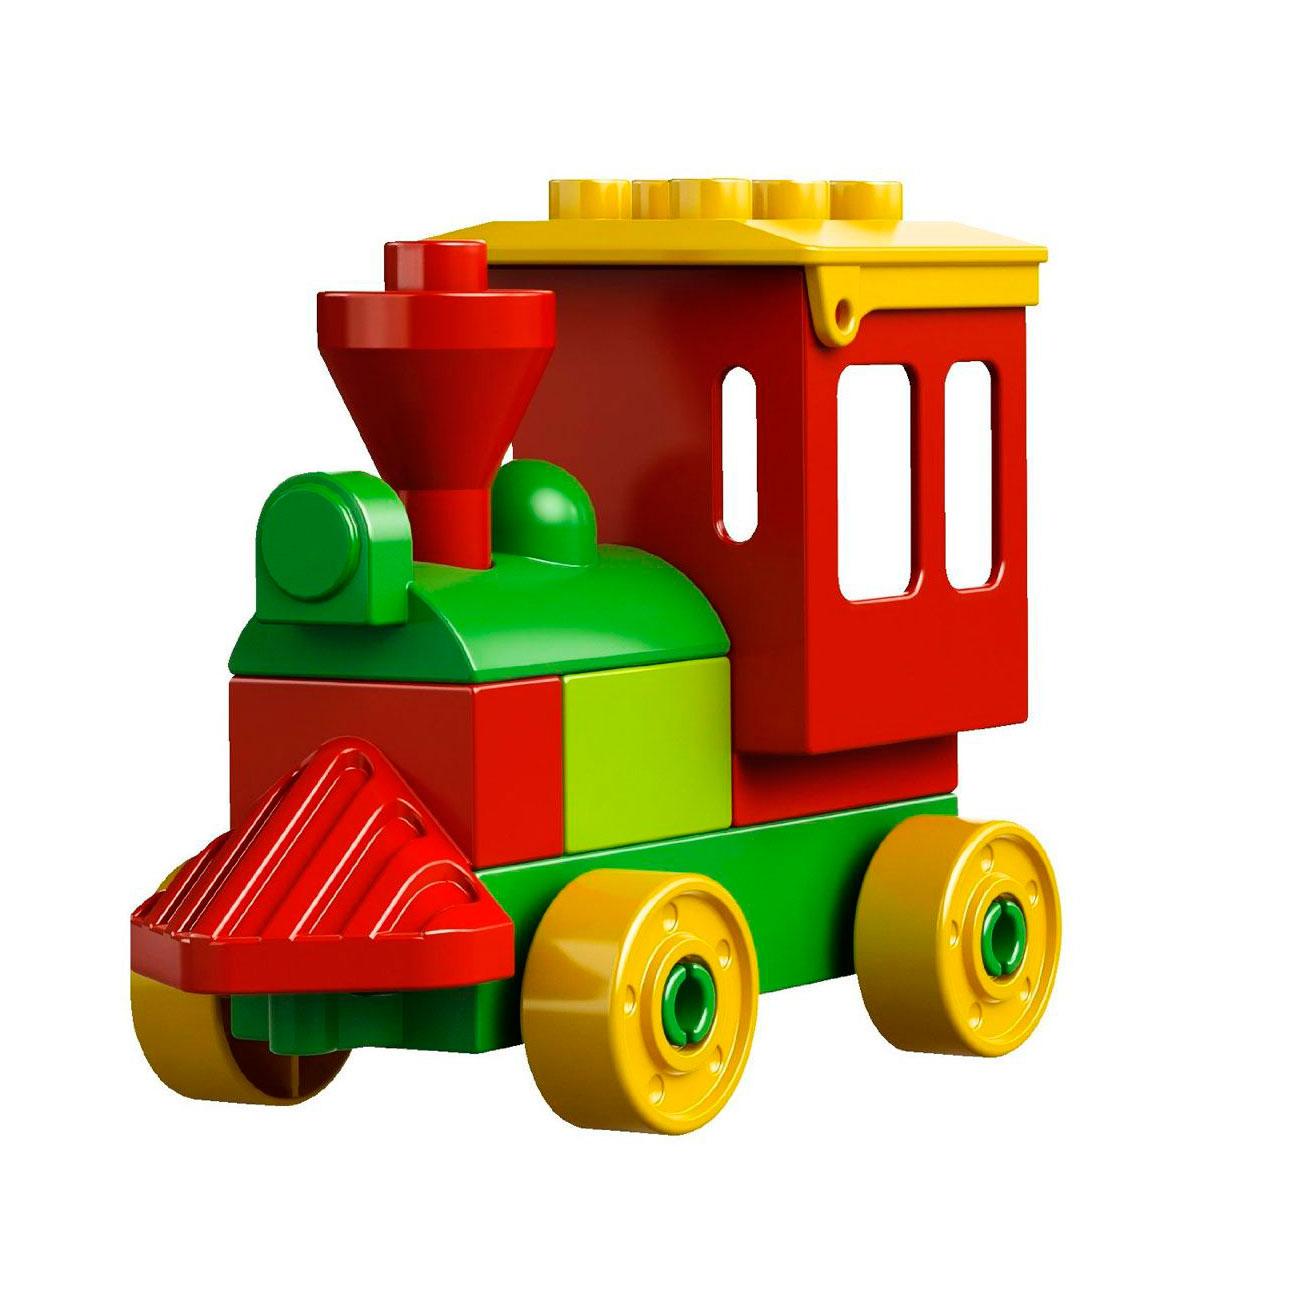 ����������� LEGO Duplo 10558 ������ � �����